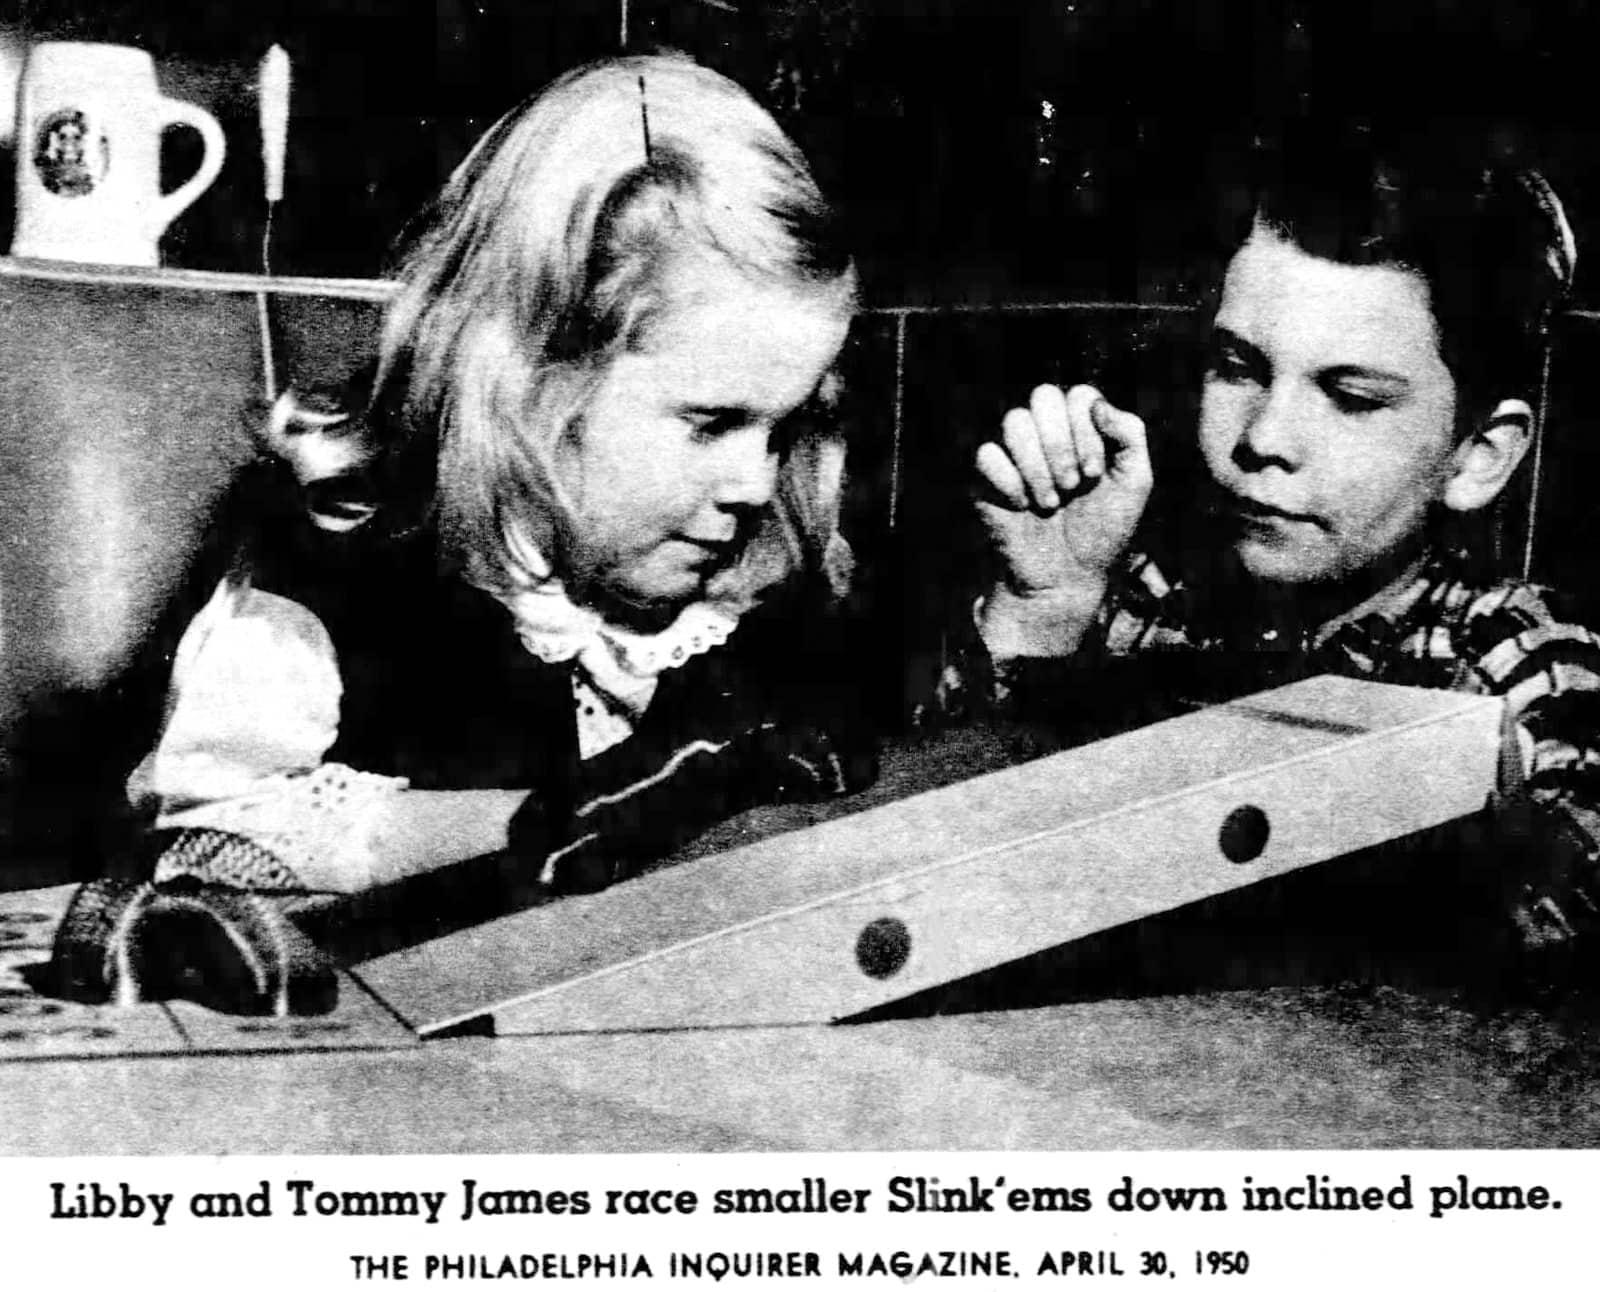 Children of Slinky toy inventor Richard James